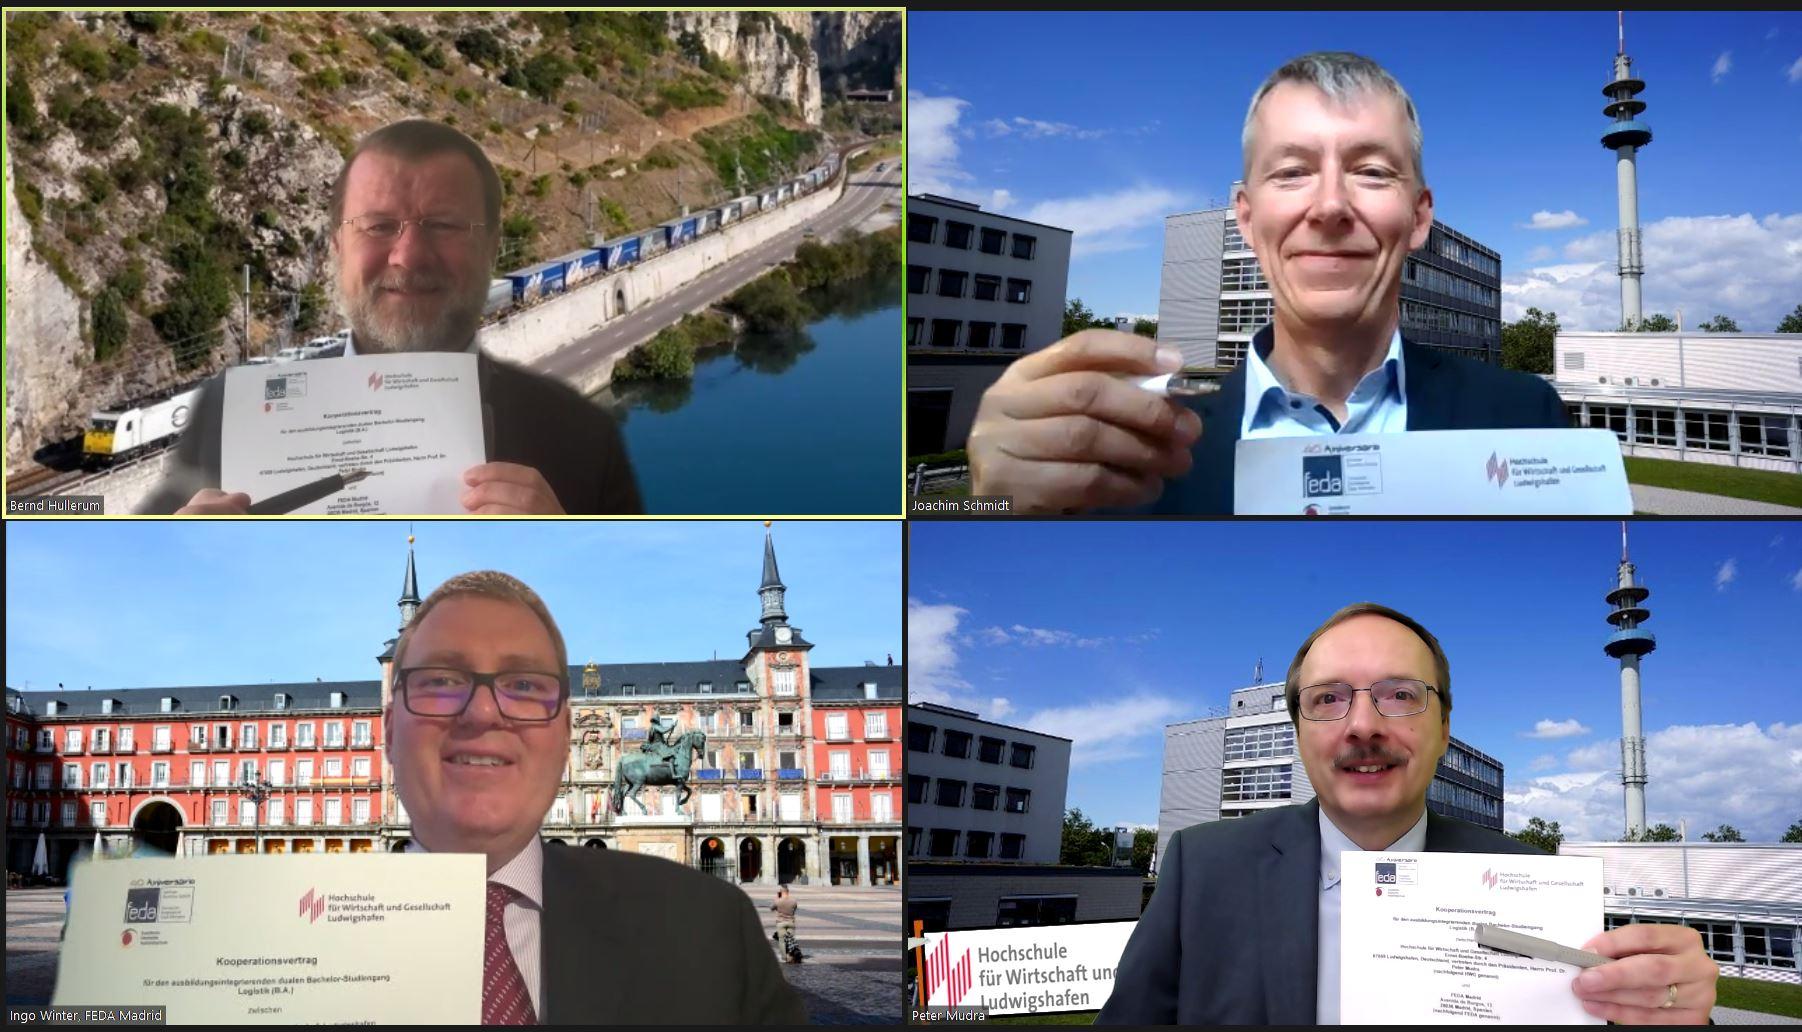 De izq. a dr. y de arriba a abajo: Bernd Hullerum, Prof. Dr. Joachim Schmidt, Ingo Winter y Prof. Dr. Peter Mudra